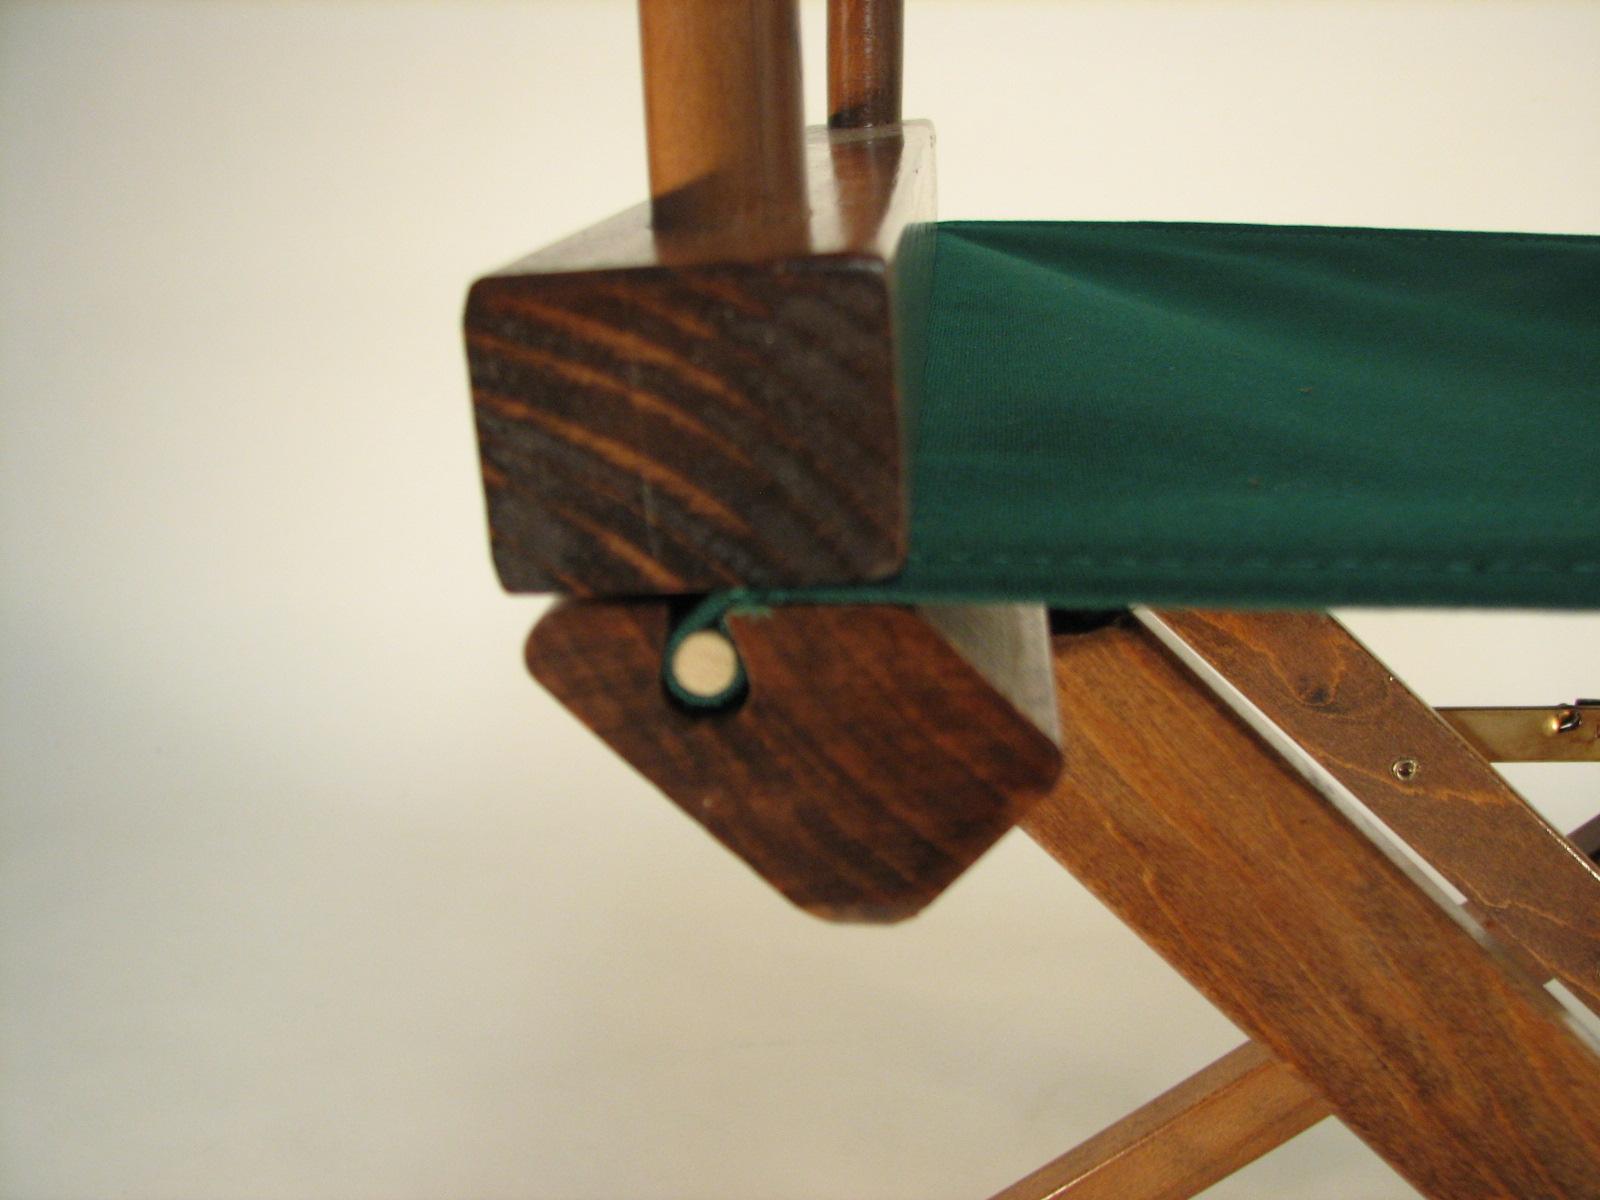 IMPRINTED Sunbrella Directoru0026#39;s Chair Covers (Round Stick), New : eBay